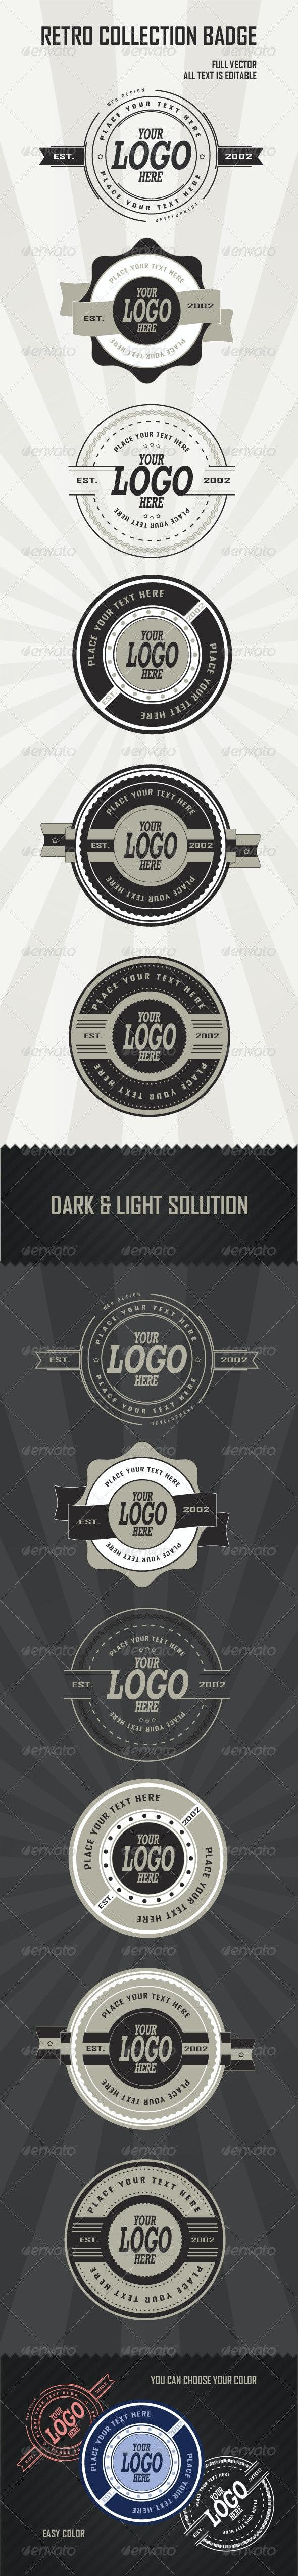 Retro Badges Collection - Badges & Stickers Web Elements